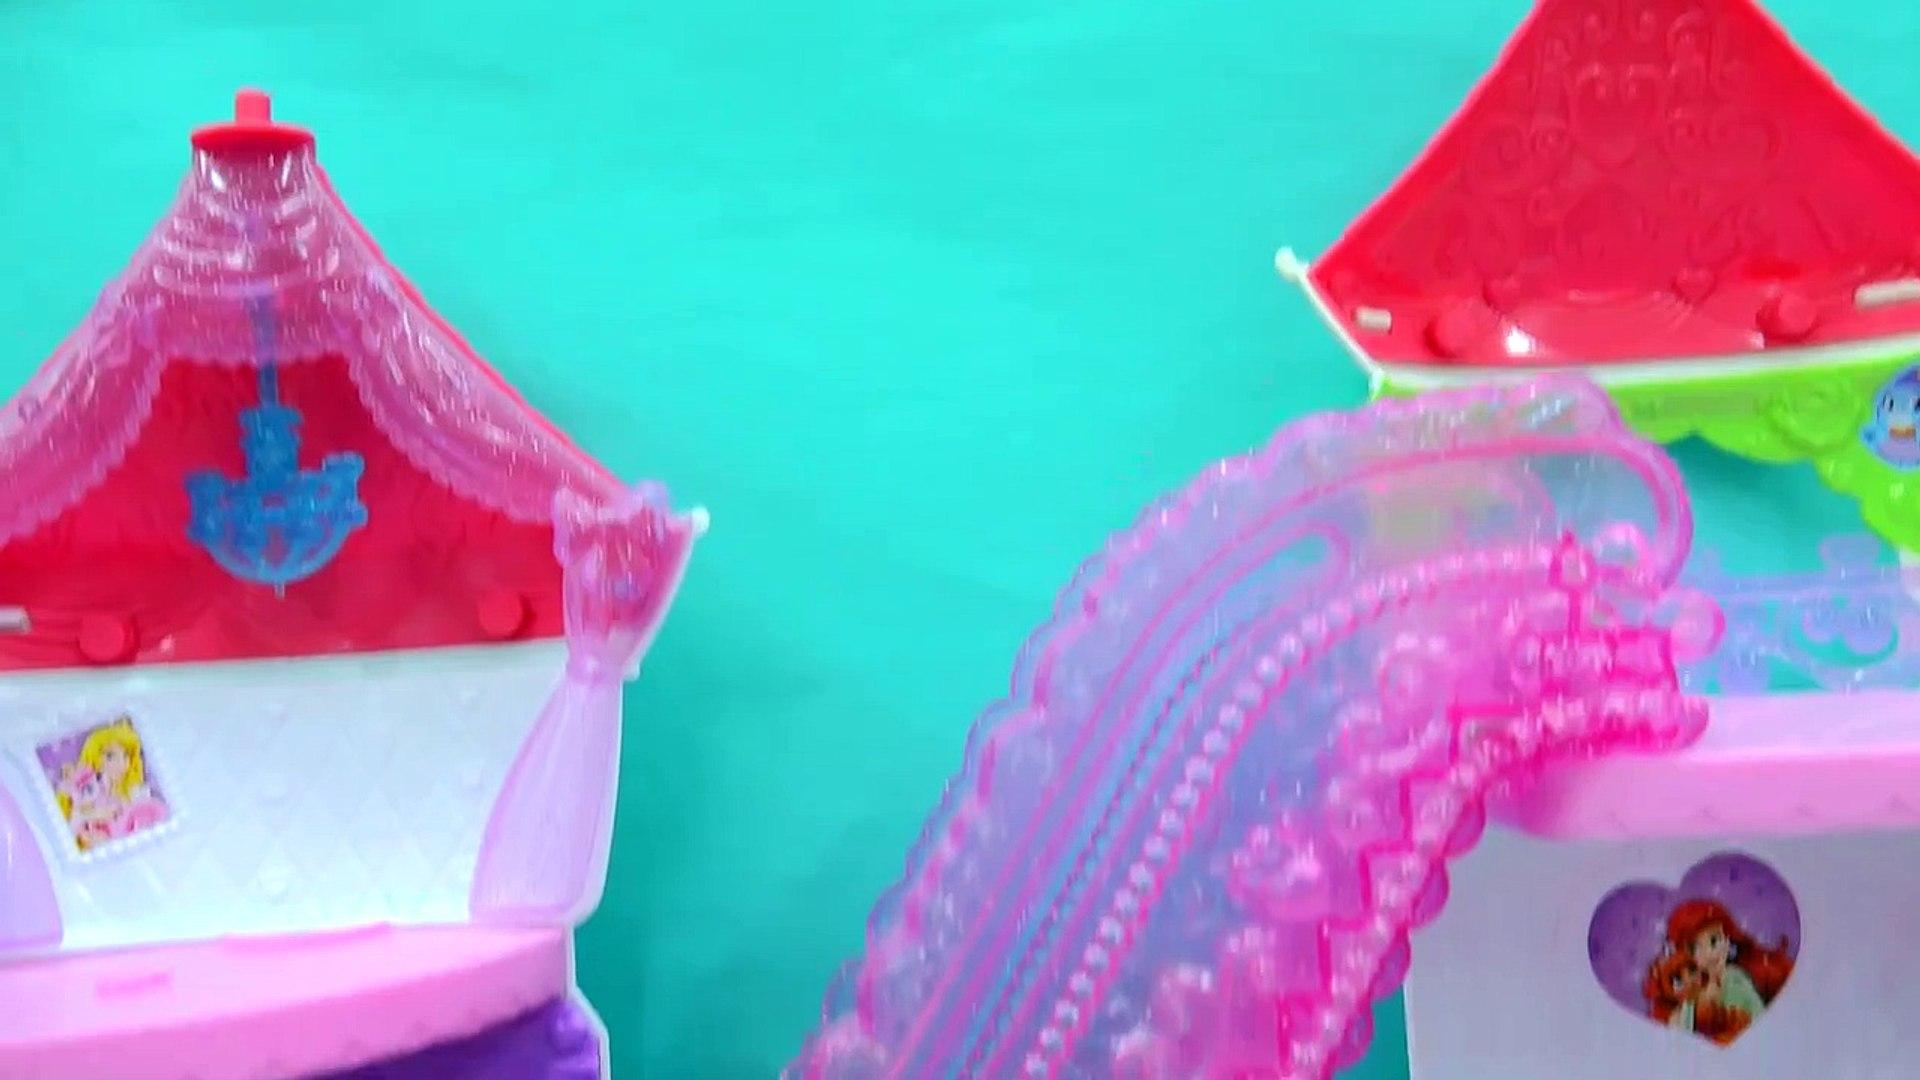 Full Box Funko Mystery Mini Surprise Barbie Doll Blind Bag Boxes - Cookieswirlc Video-VBeO3